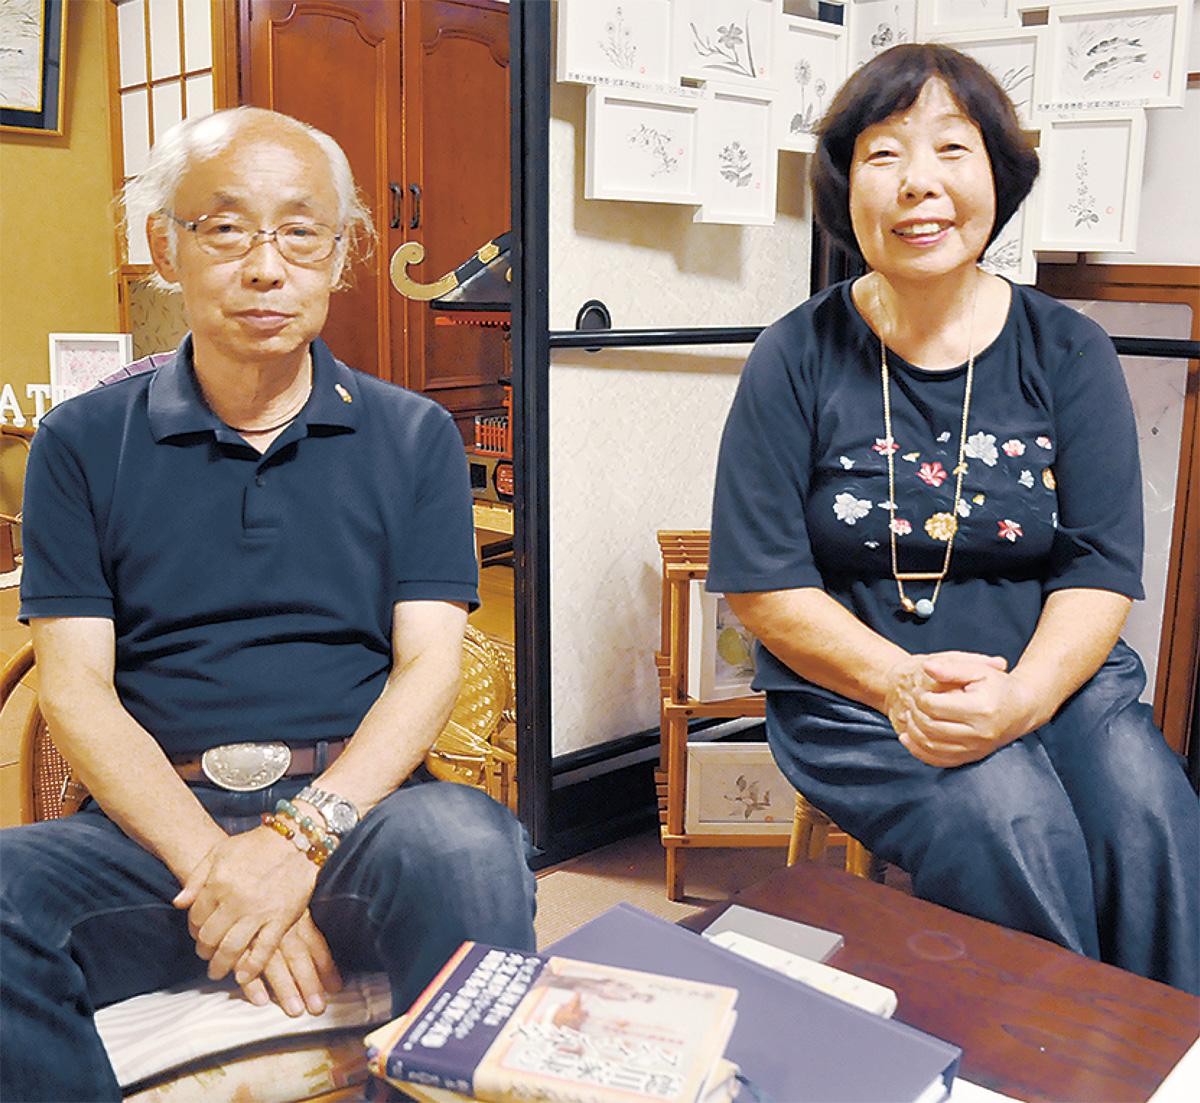 「浦賀」世界遺産登録願い